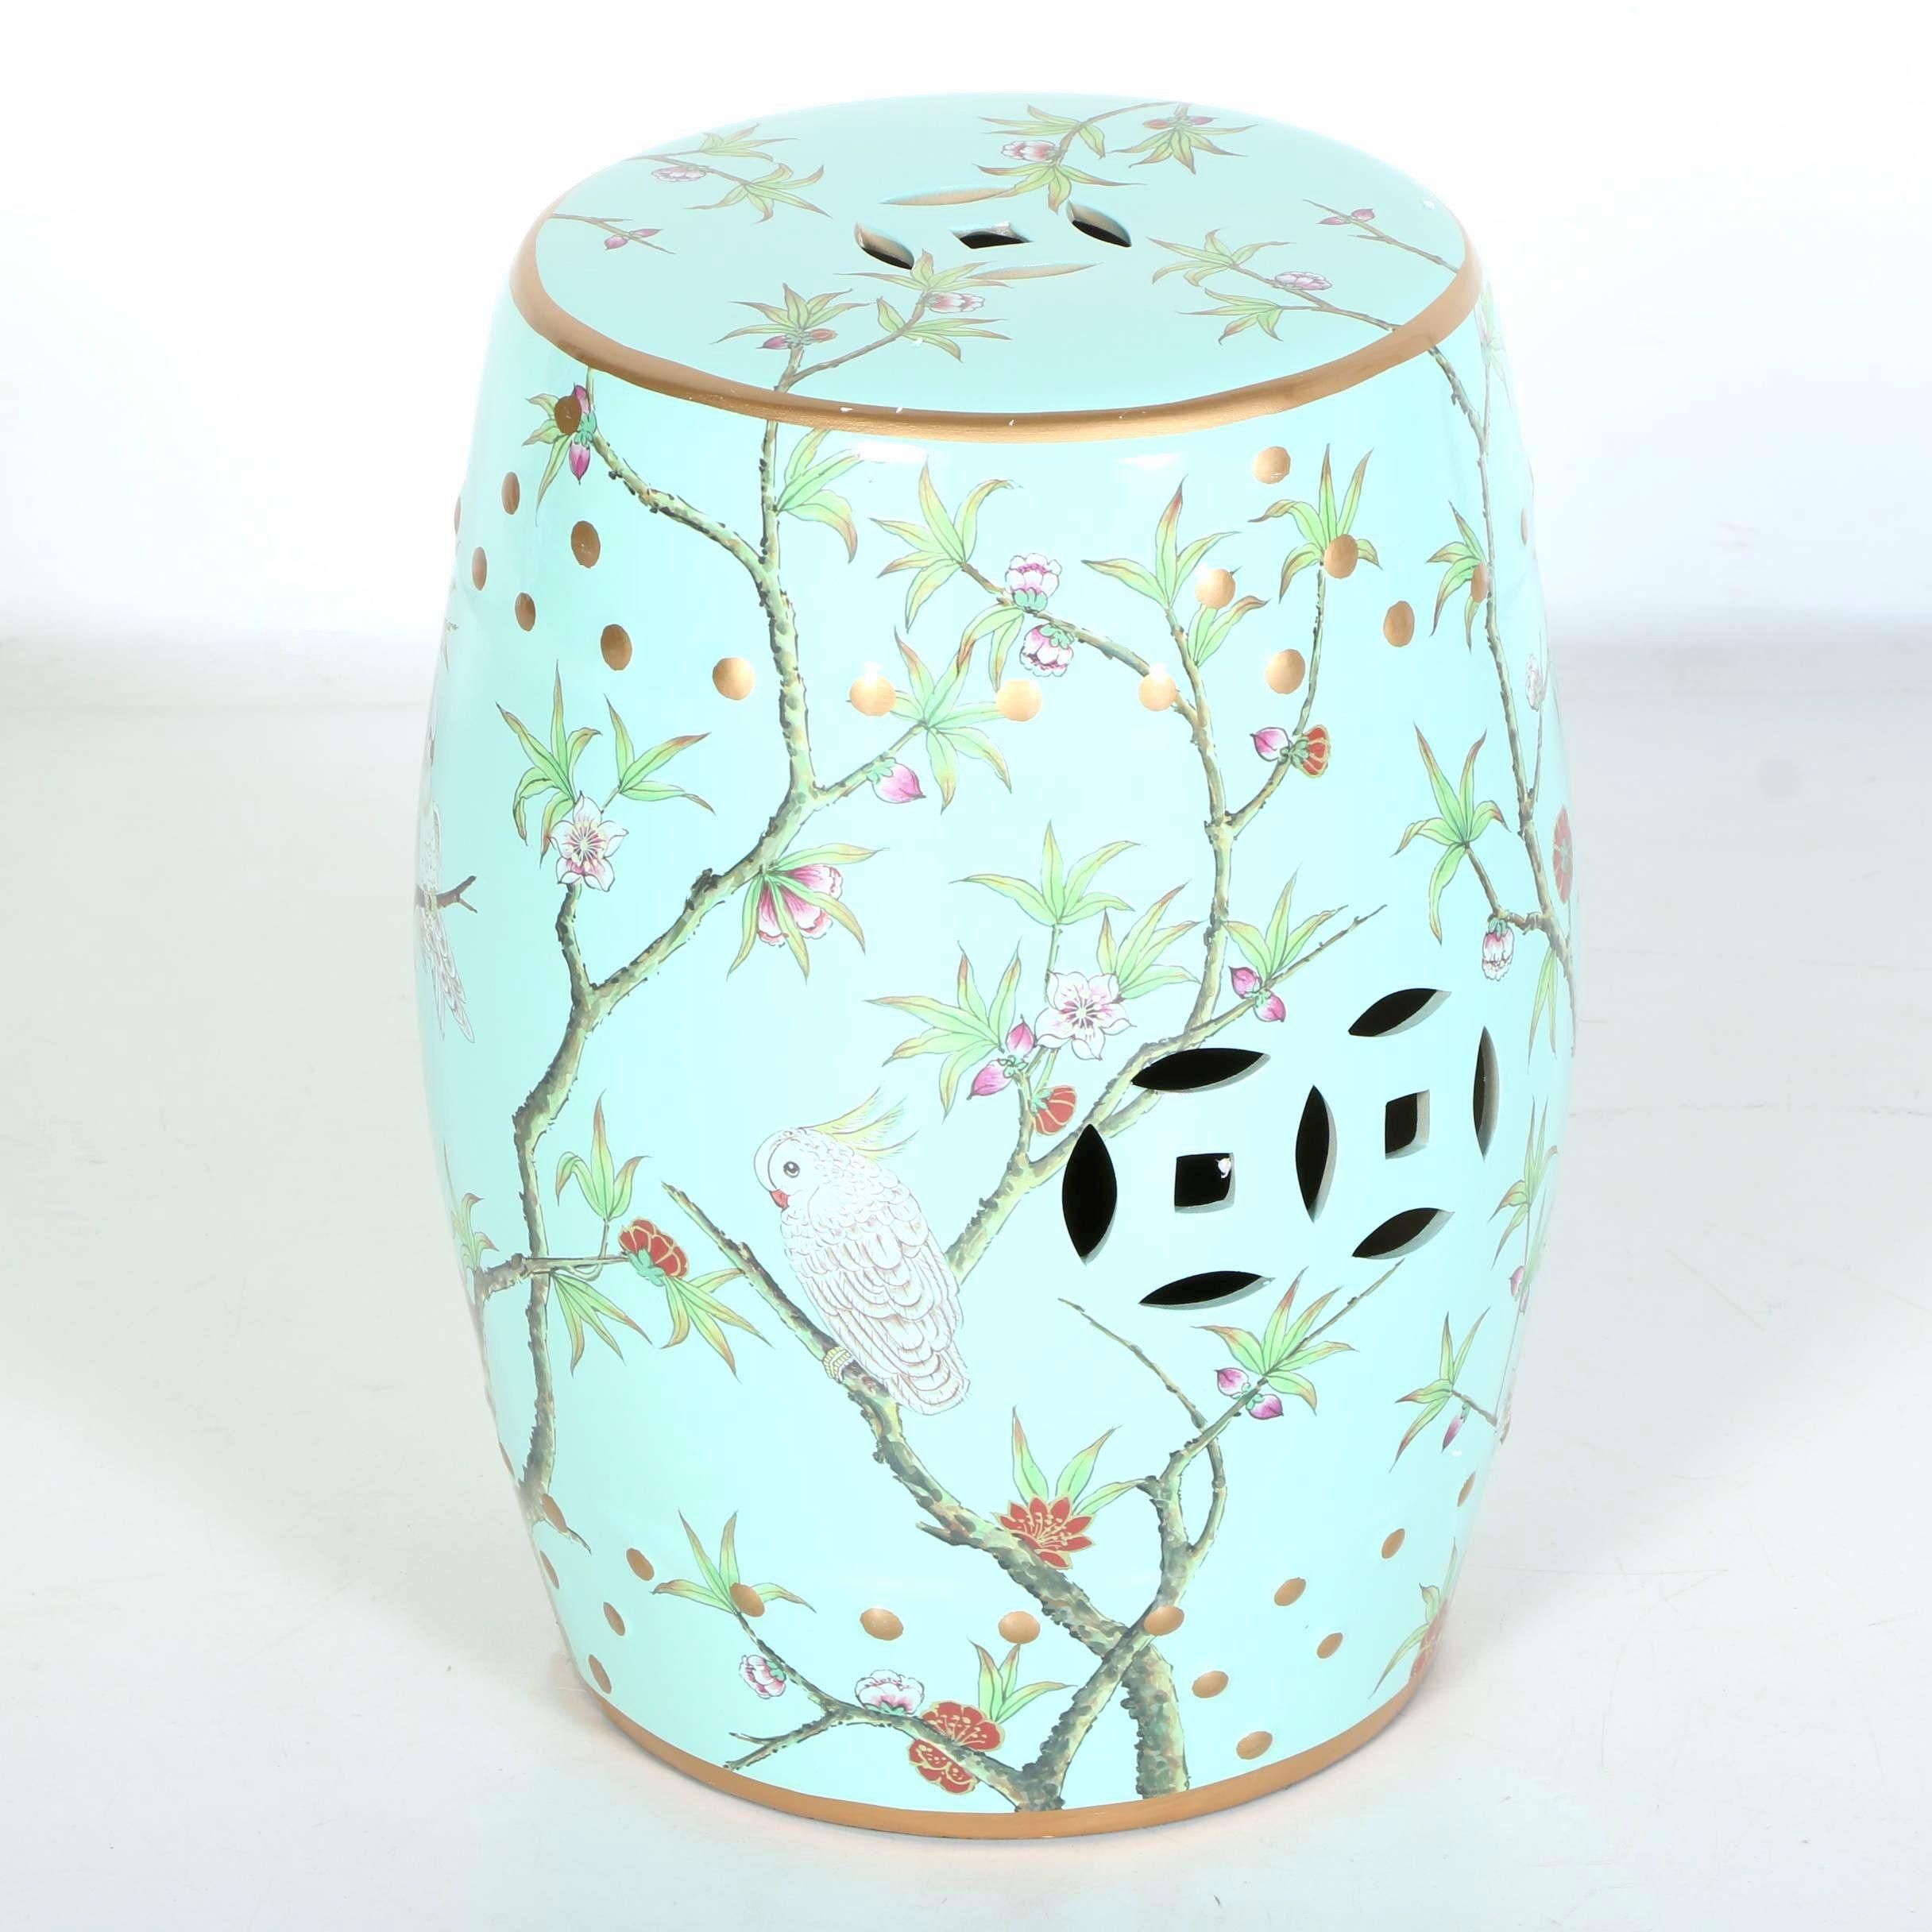 Chinese Blue Ceramic Garden Stool